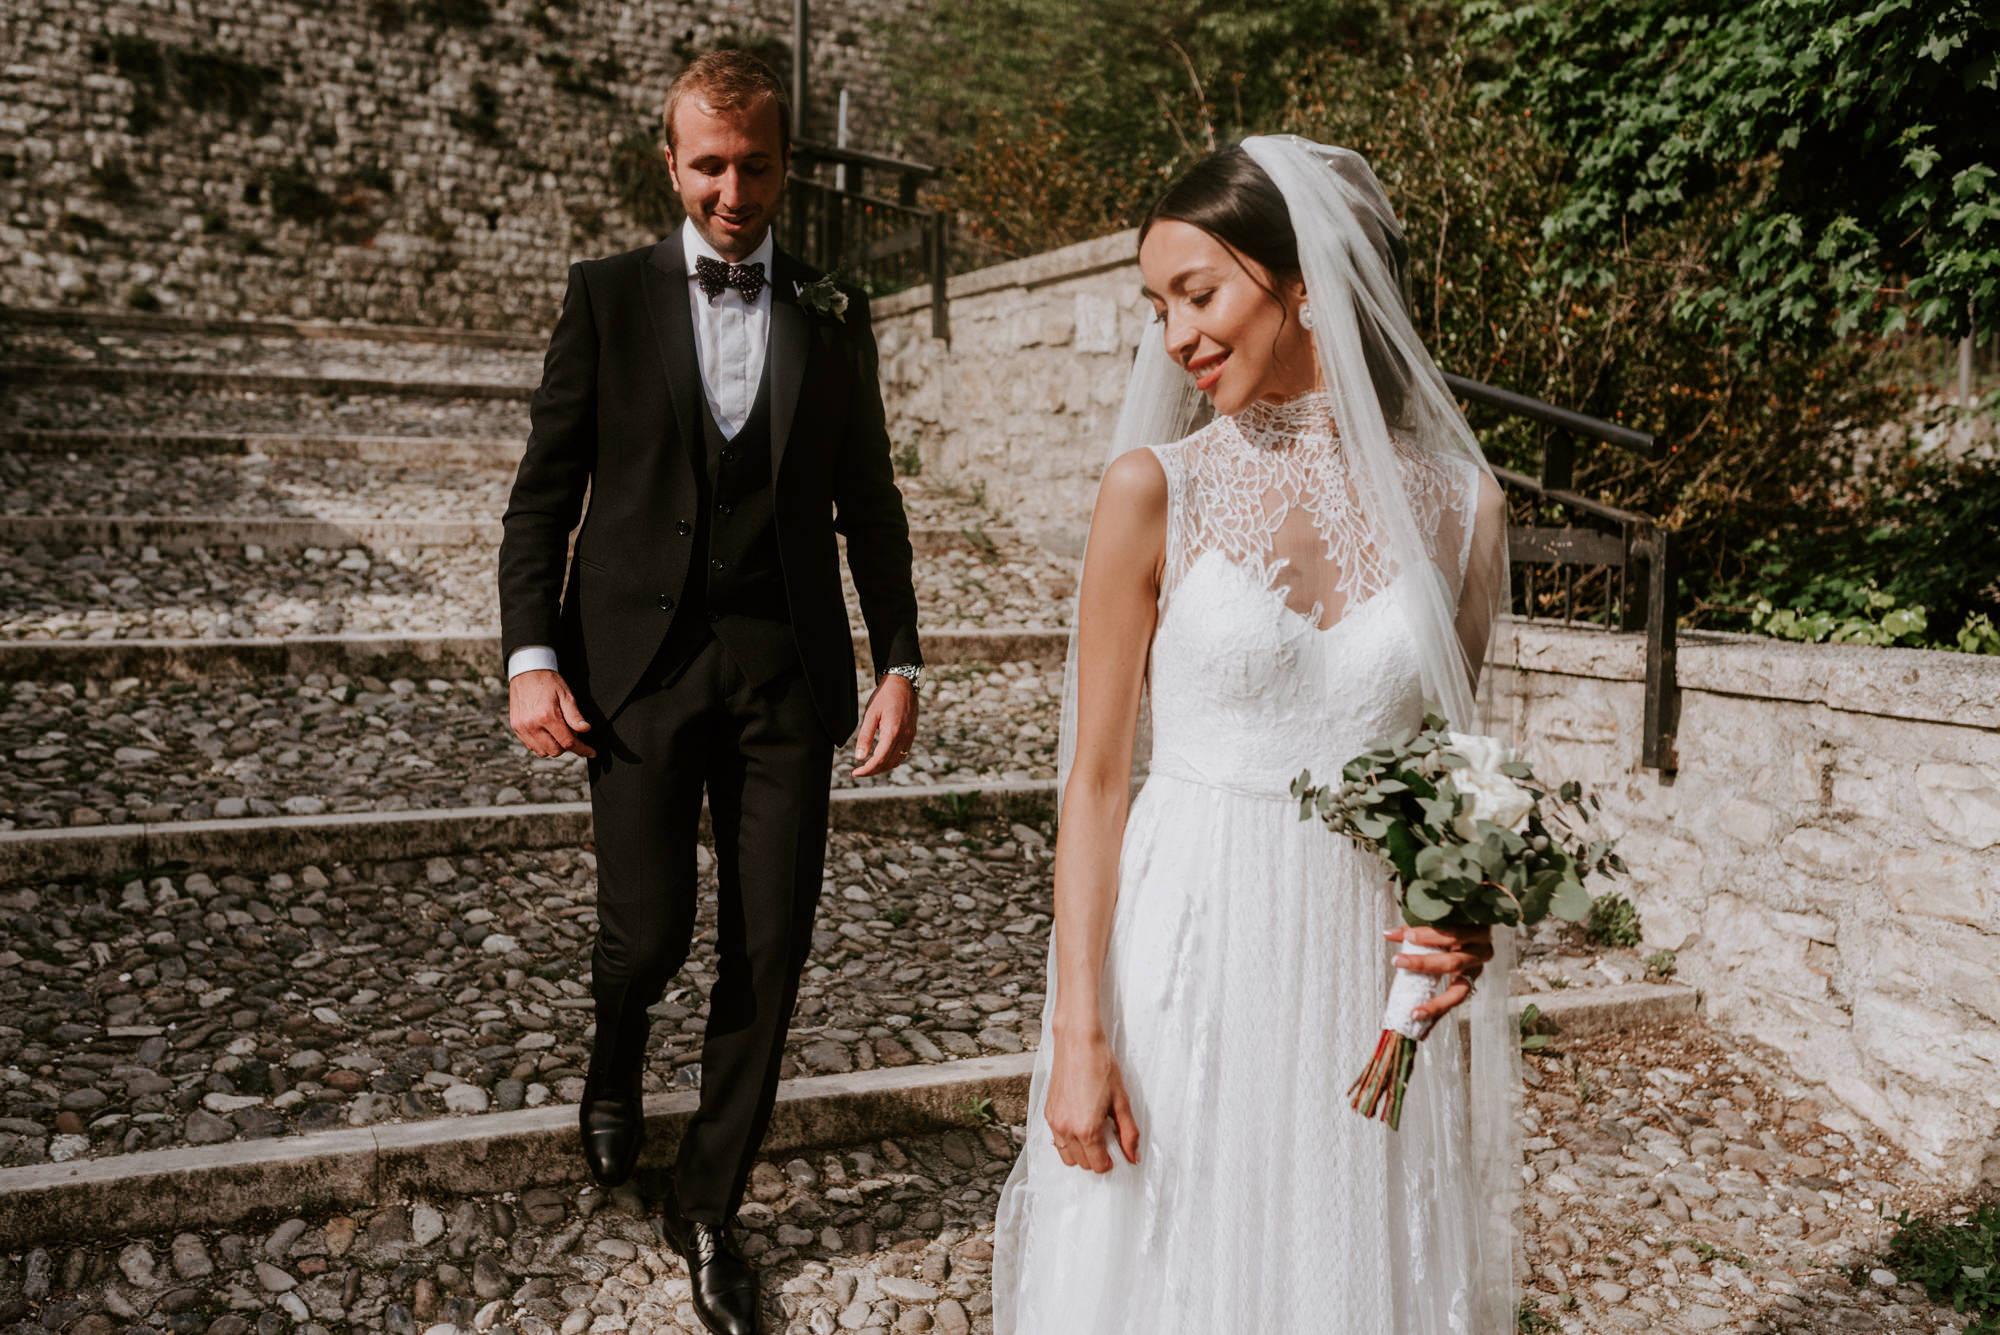 FOTO+PHOTO+BODA+WEDDING+ITALIA+ITALY+MAURICIO+GARAY+MAURICIOGARAY+WEDDINPHOTOGRAPHER+FOTOGRAFODEBODA-1224.jpg